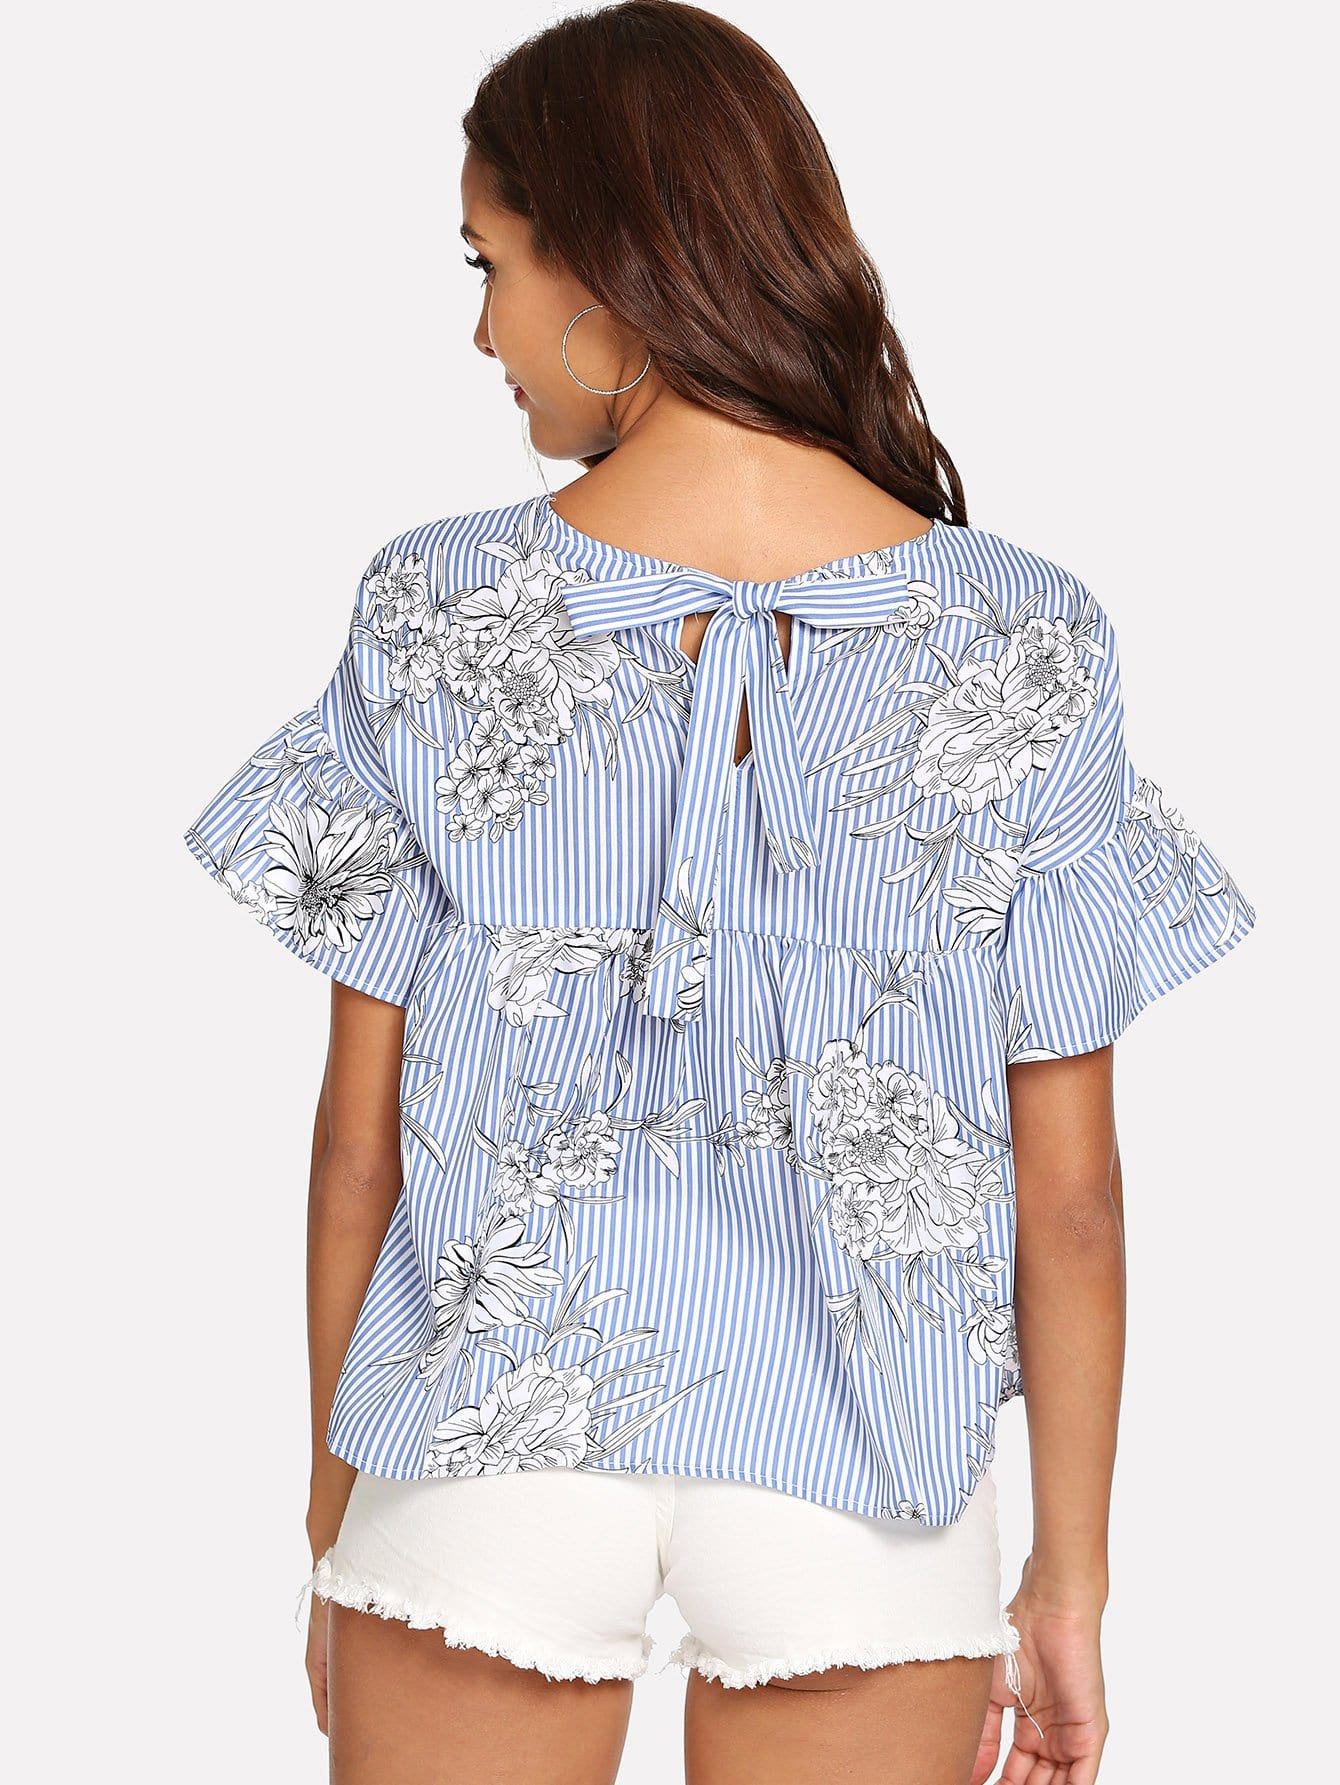 Купить Ruffle Sleeve Floral & Stripe Top, Giulia, SheIn